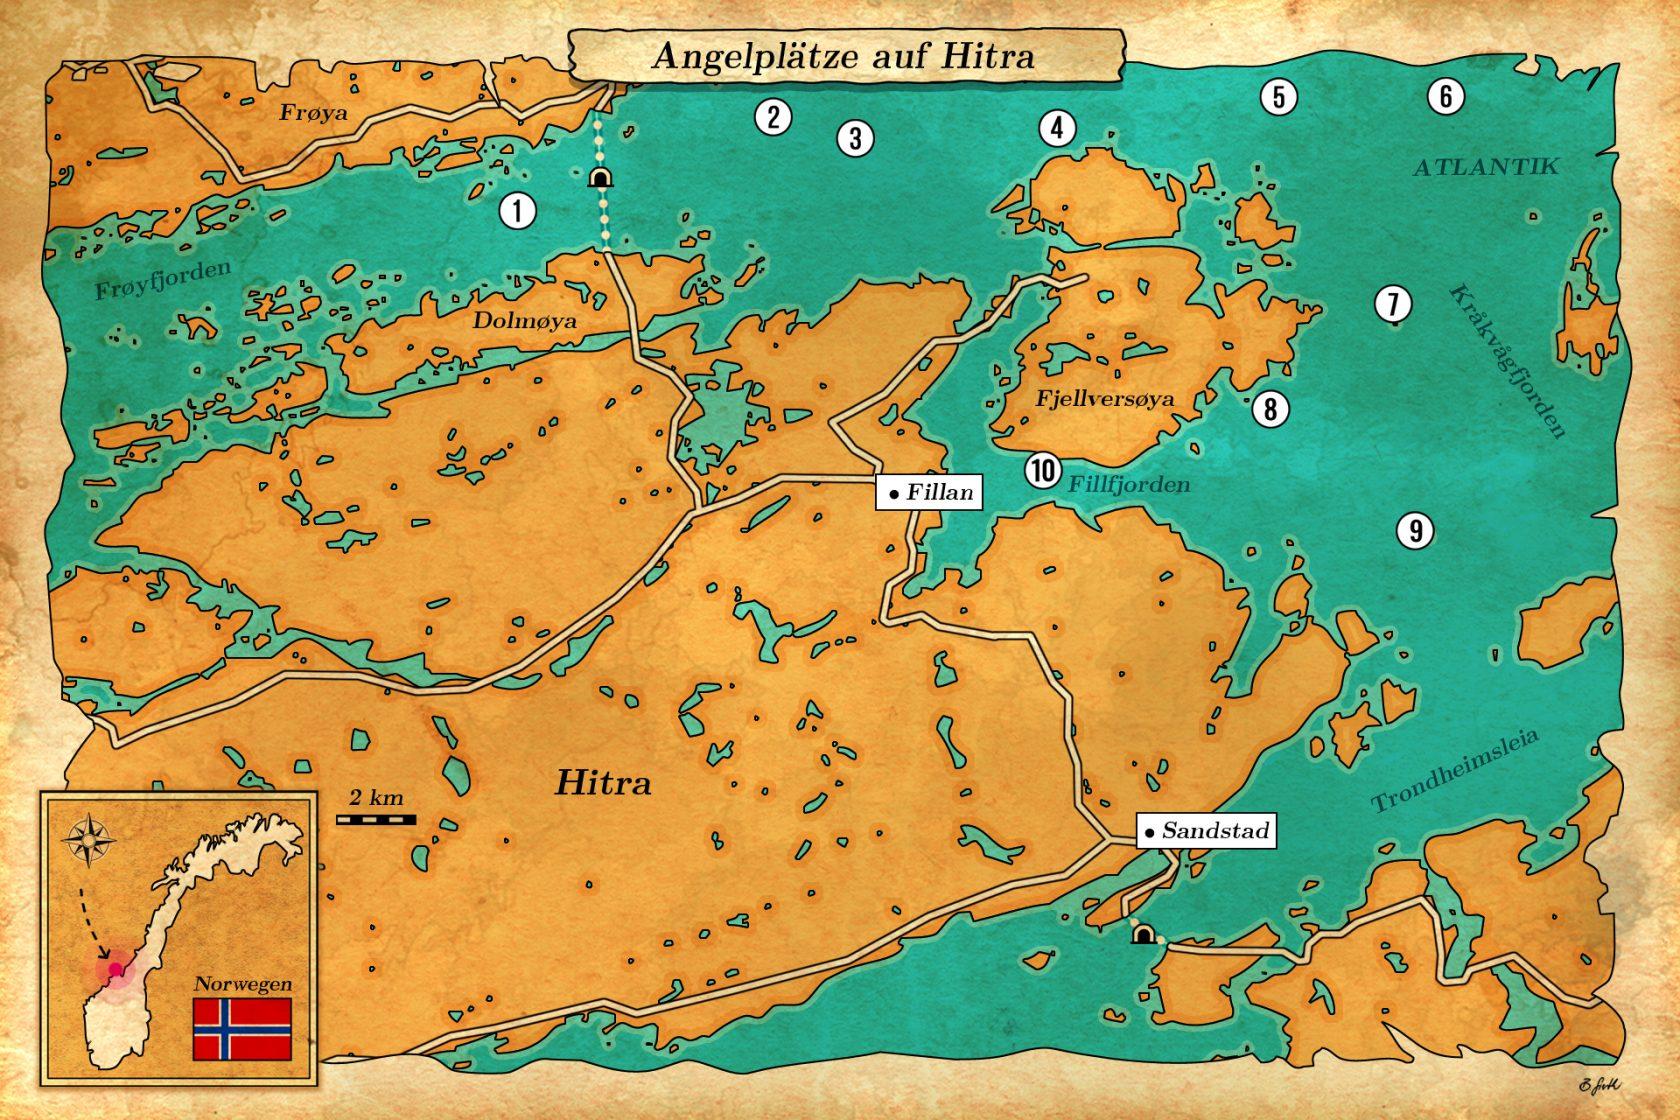 Angelplätze in Seekarte Hitra